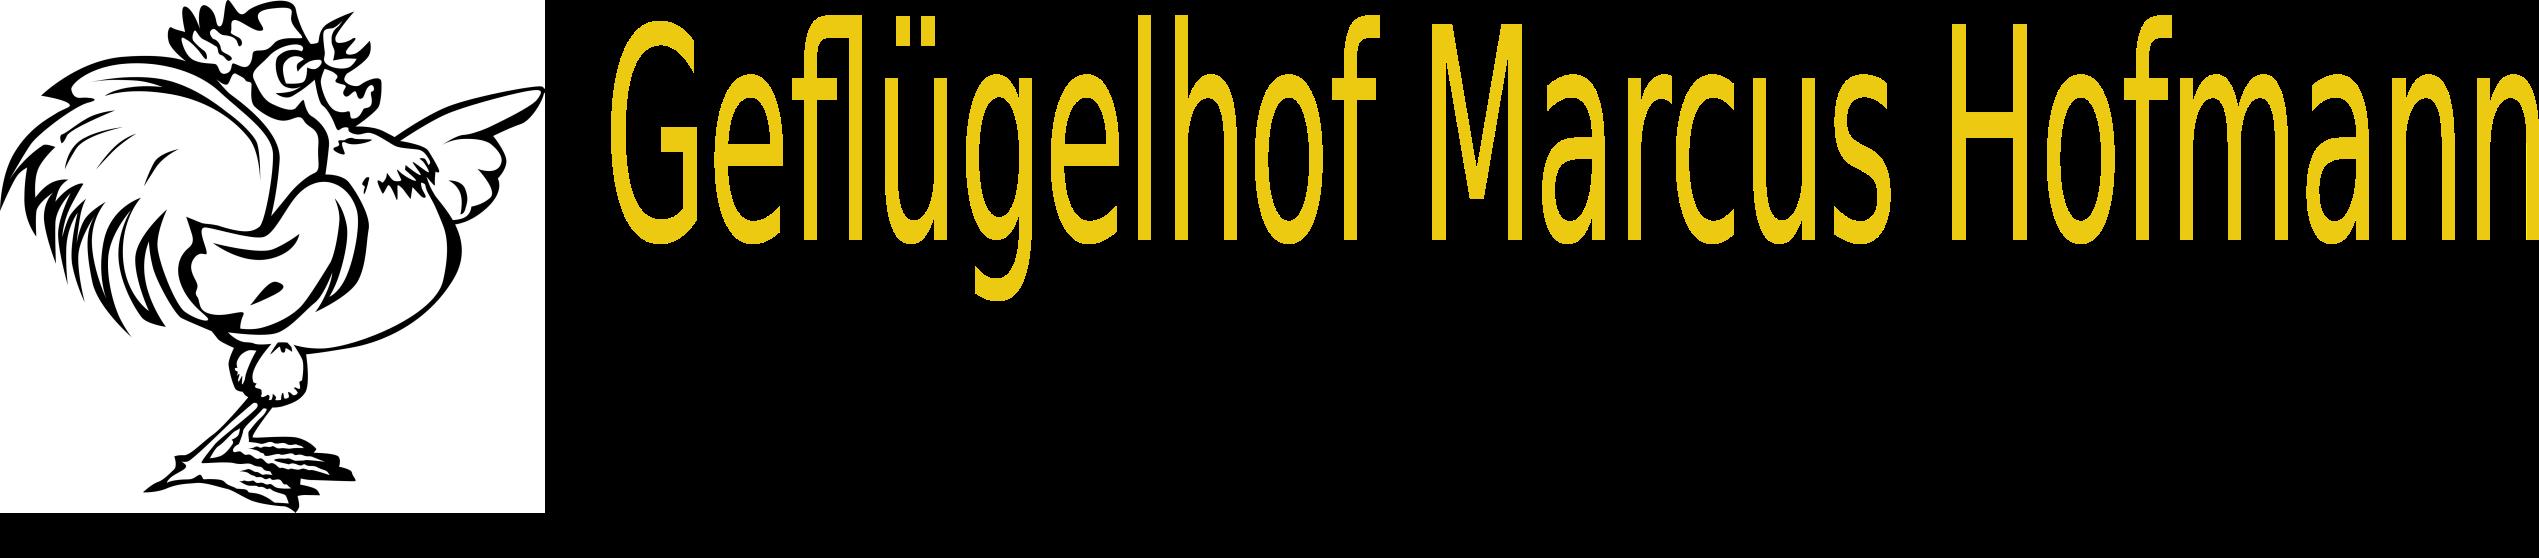 Gefluegelhof Marcus Hofmann